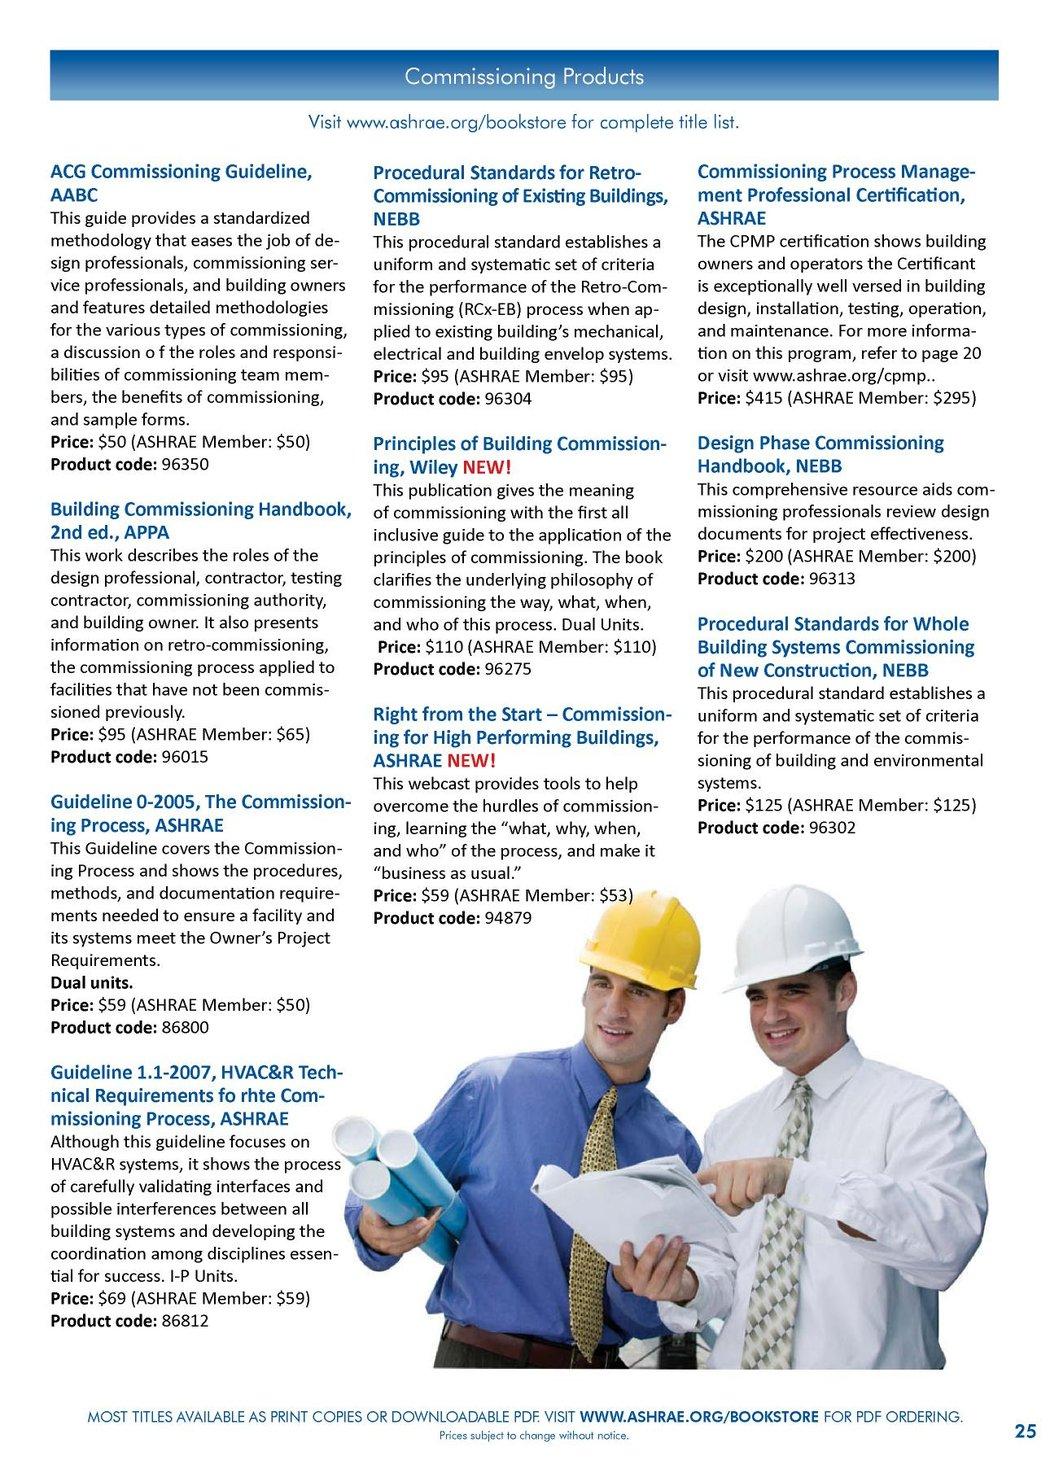 ASHRAE Publications Catalog - Summer 2010